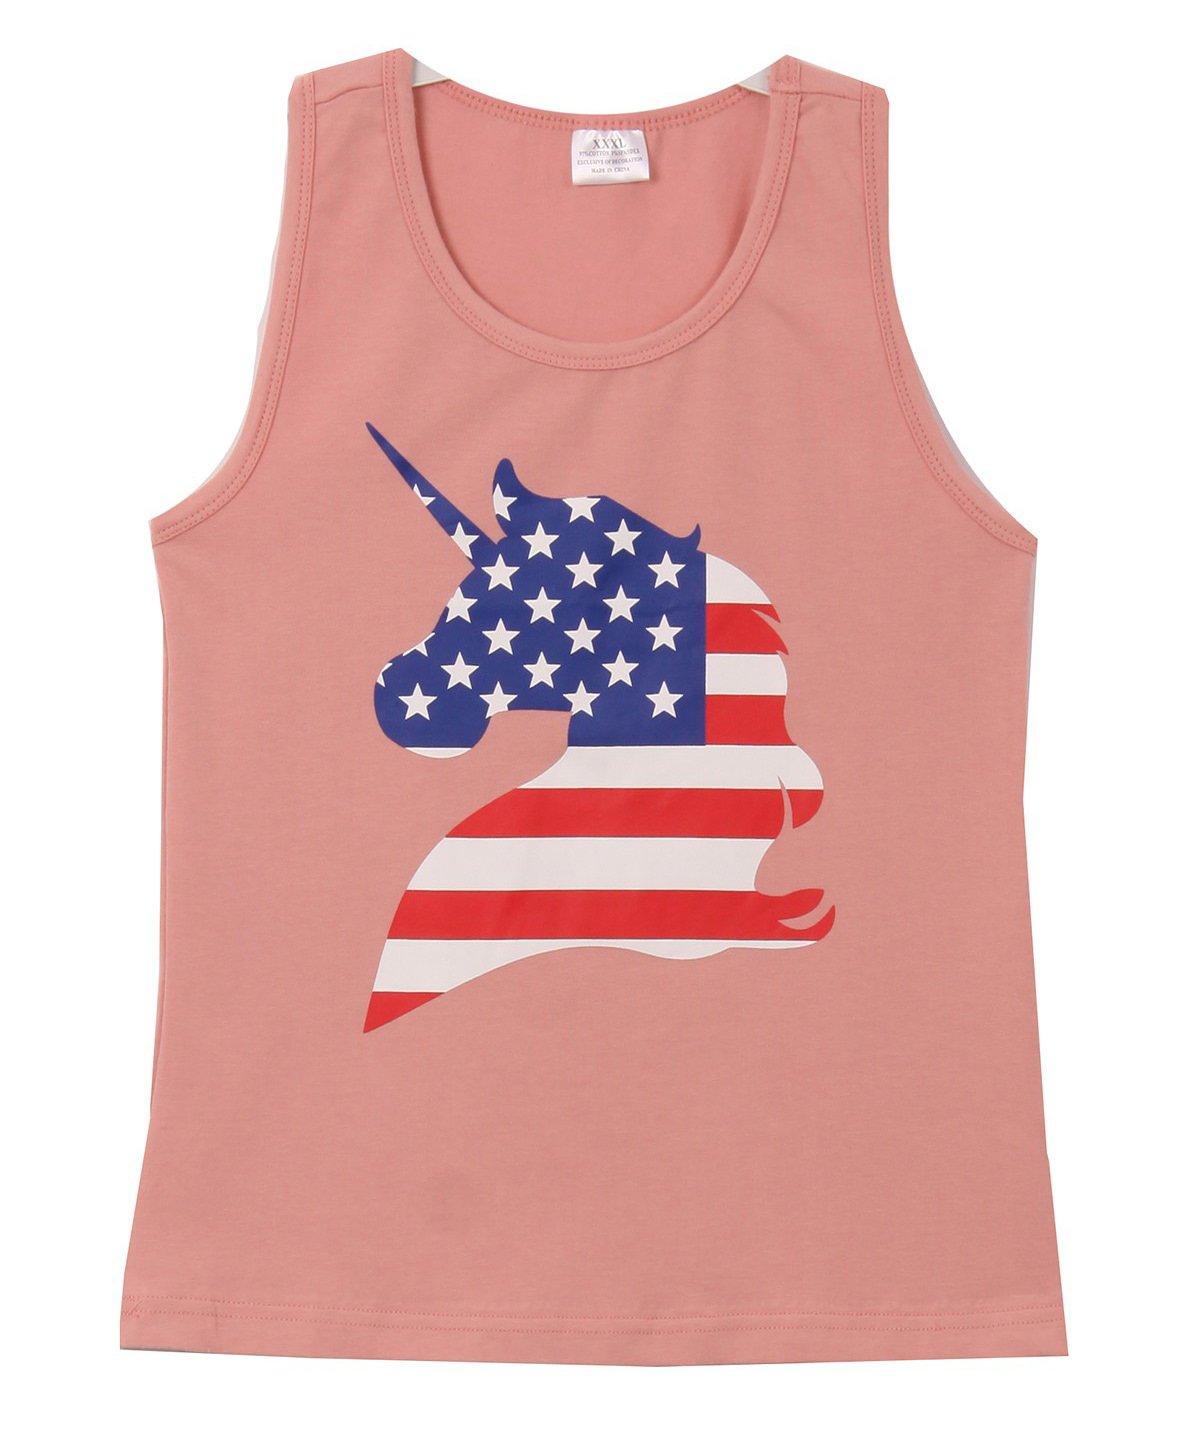 Big Girls' Unicorn Flag Pattern Summer Cotton Raglan Tank Top T-Shirt Tee Blush 7 XXL (P318126P)